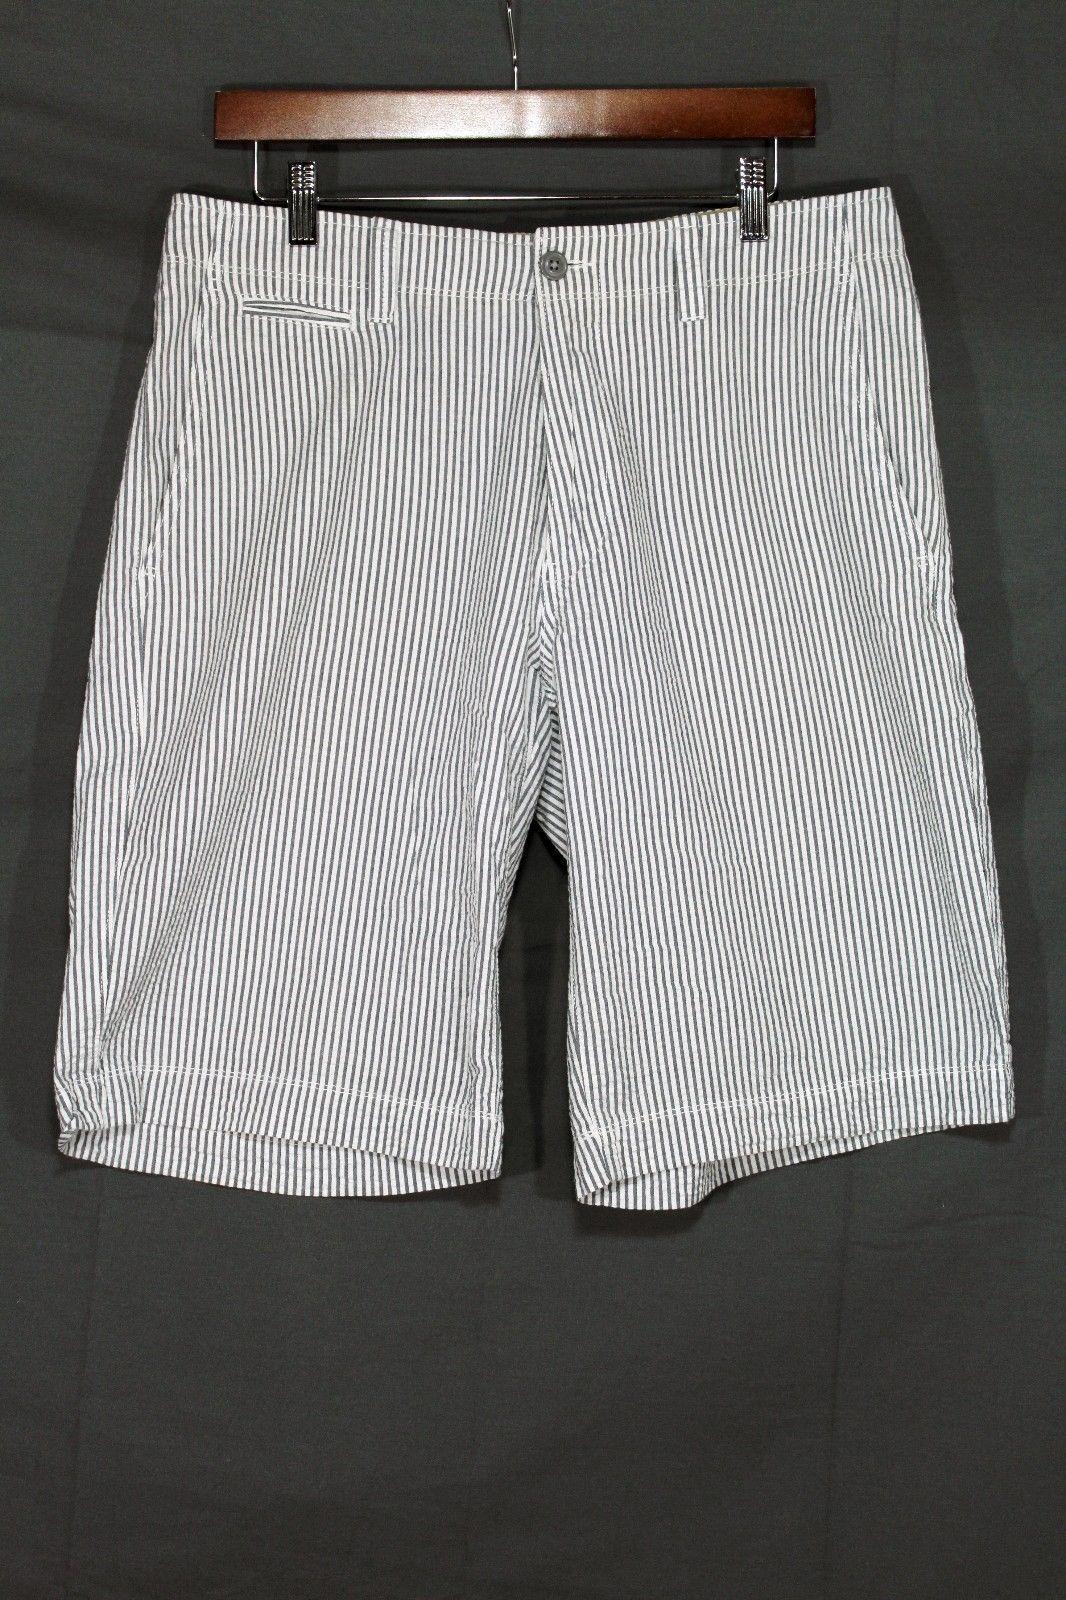 NEW Men's Gap Flat Front Seersucker Shorts White / Grey Stripe Short 33